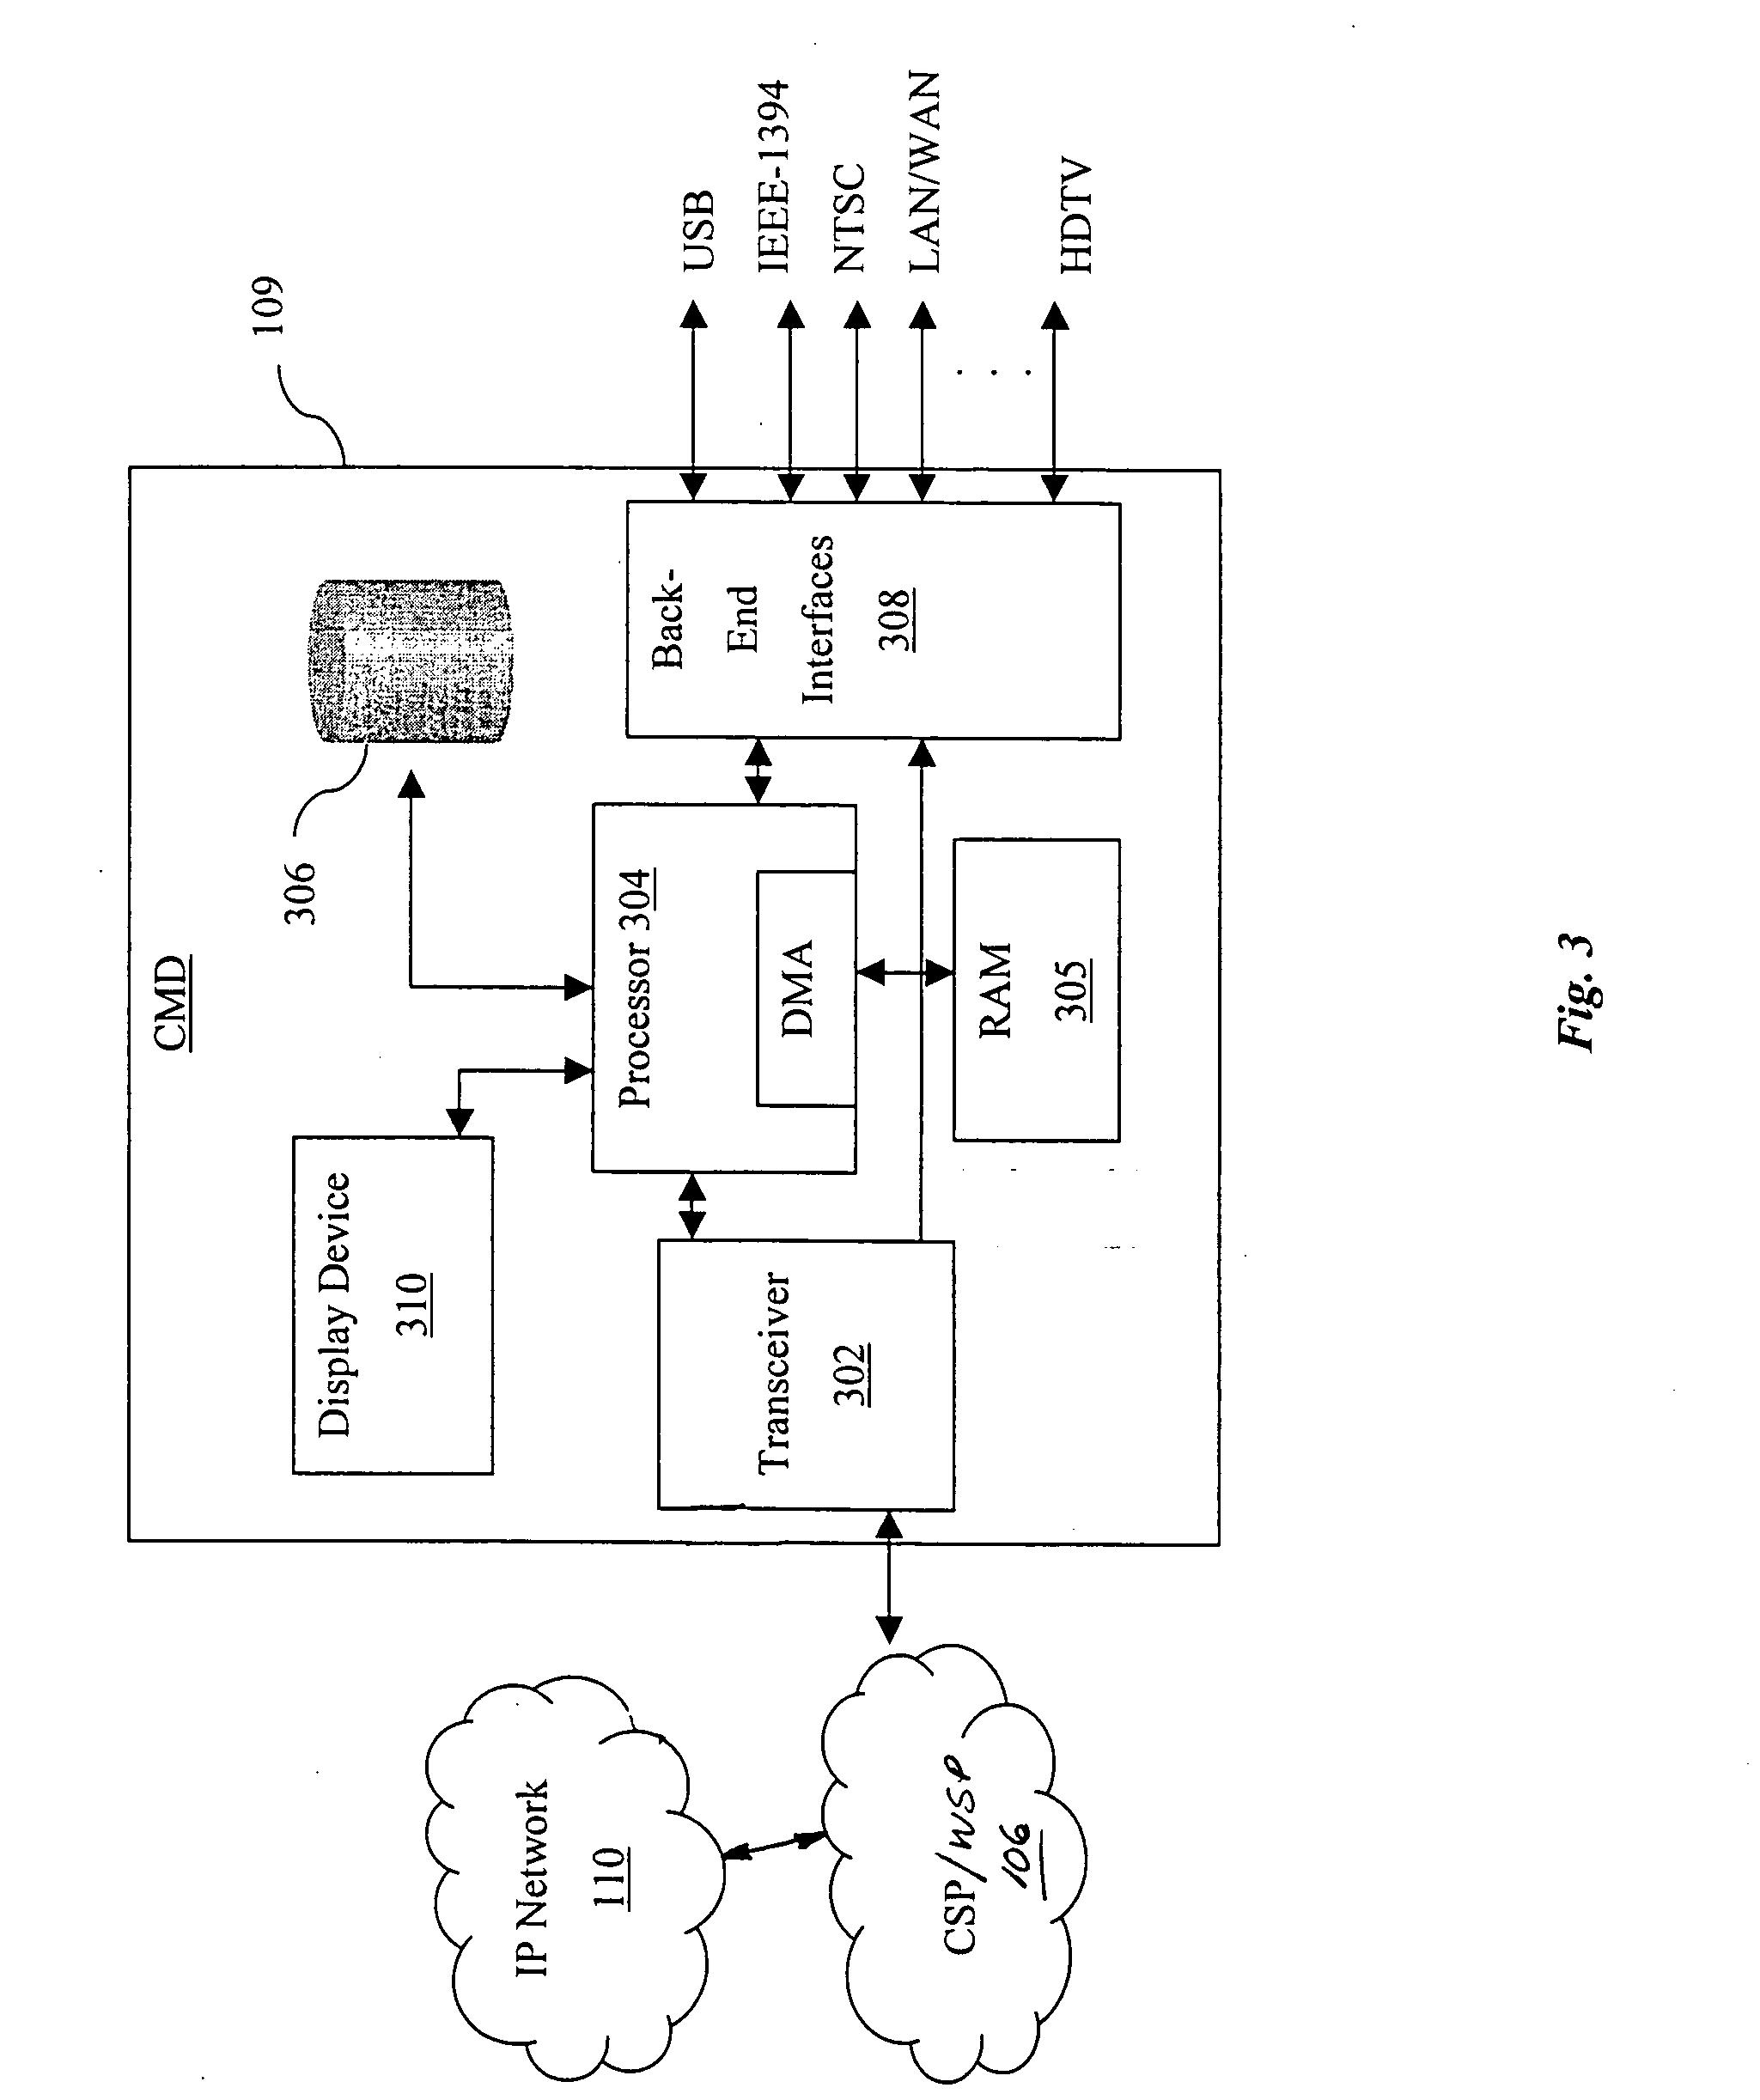 Patent Us 20070094691a1 Meter Using Calculator Cob Tutorial Electronic Circuit Diagram 0 Petitions